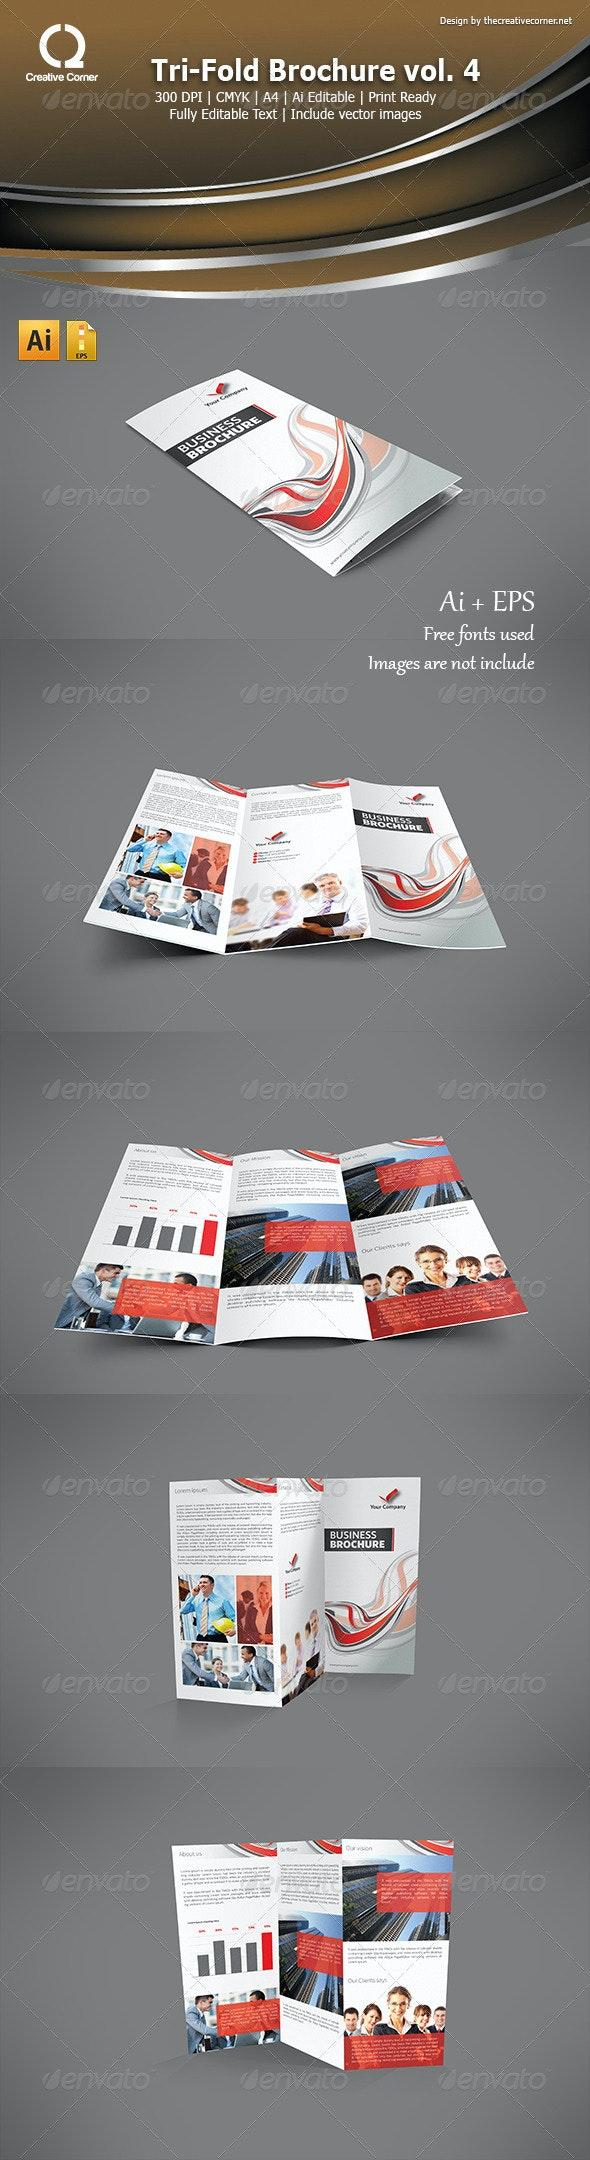 Multipurpose Tri-Fold Brochure Template Vol 04 - Corporate Brochures